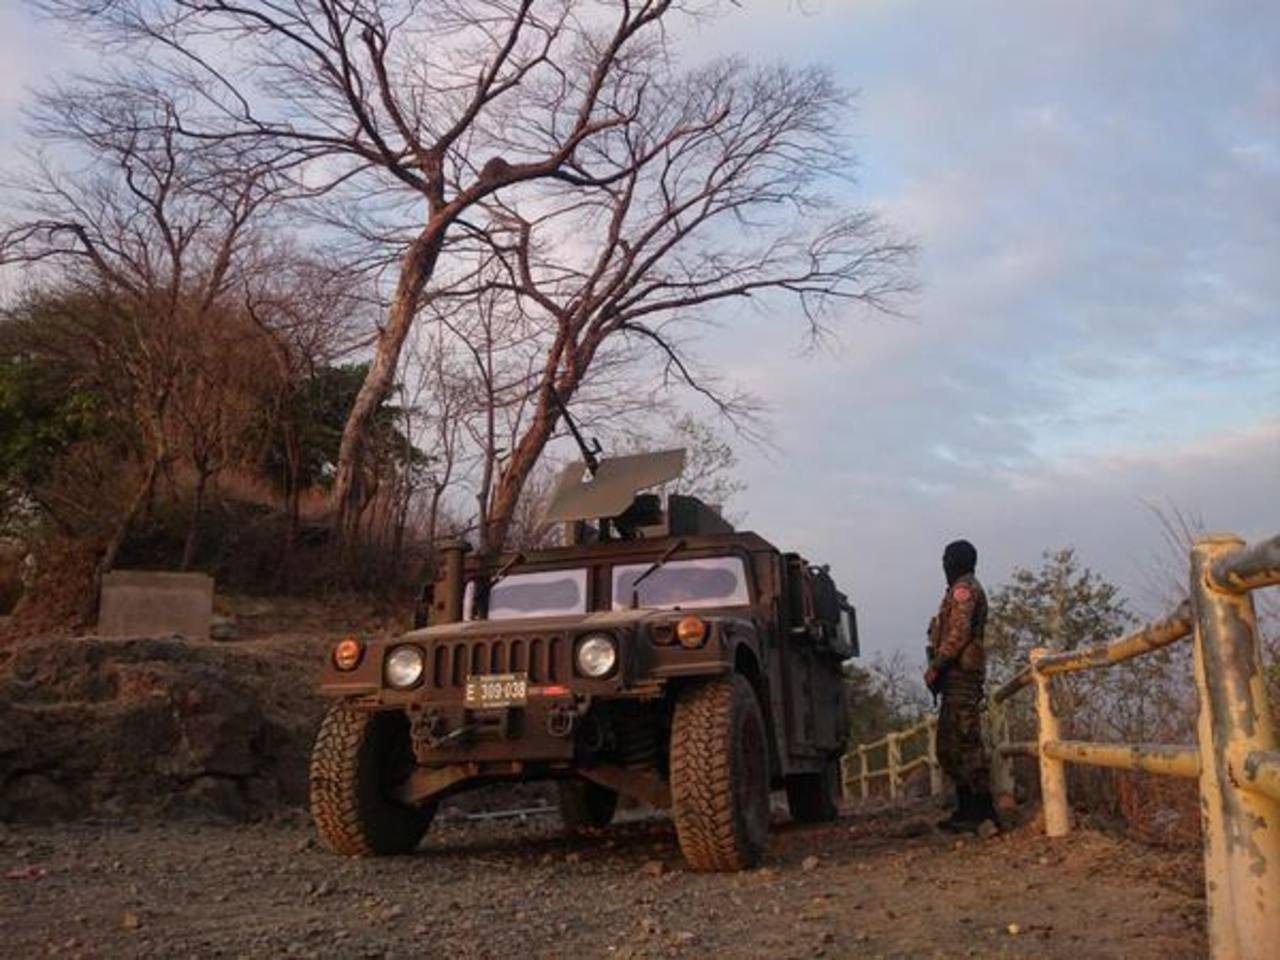 Panchimalco militarizado tras asesinato de un seguridad del Presidente